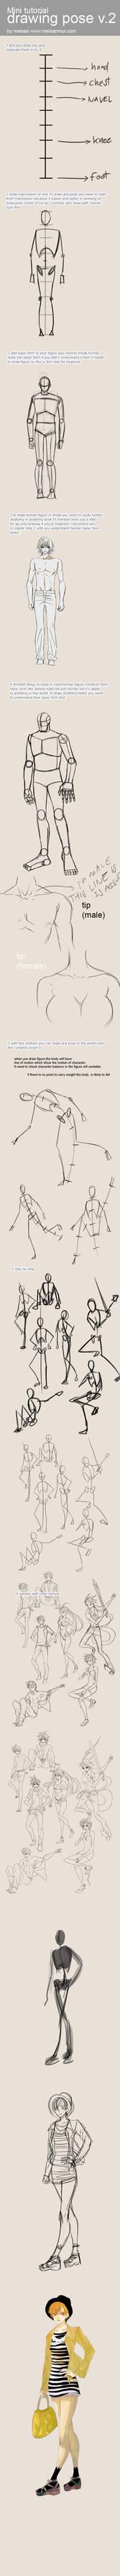 minitutor,draw pose v.2 edit